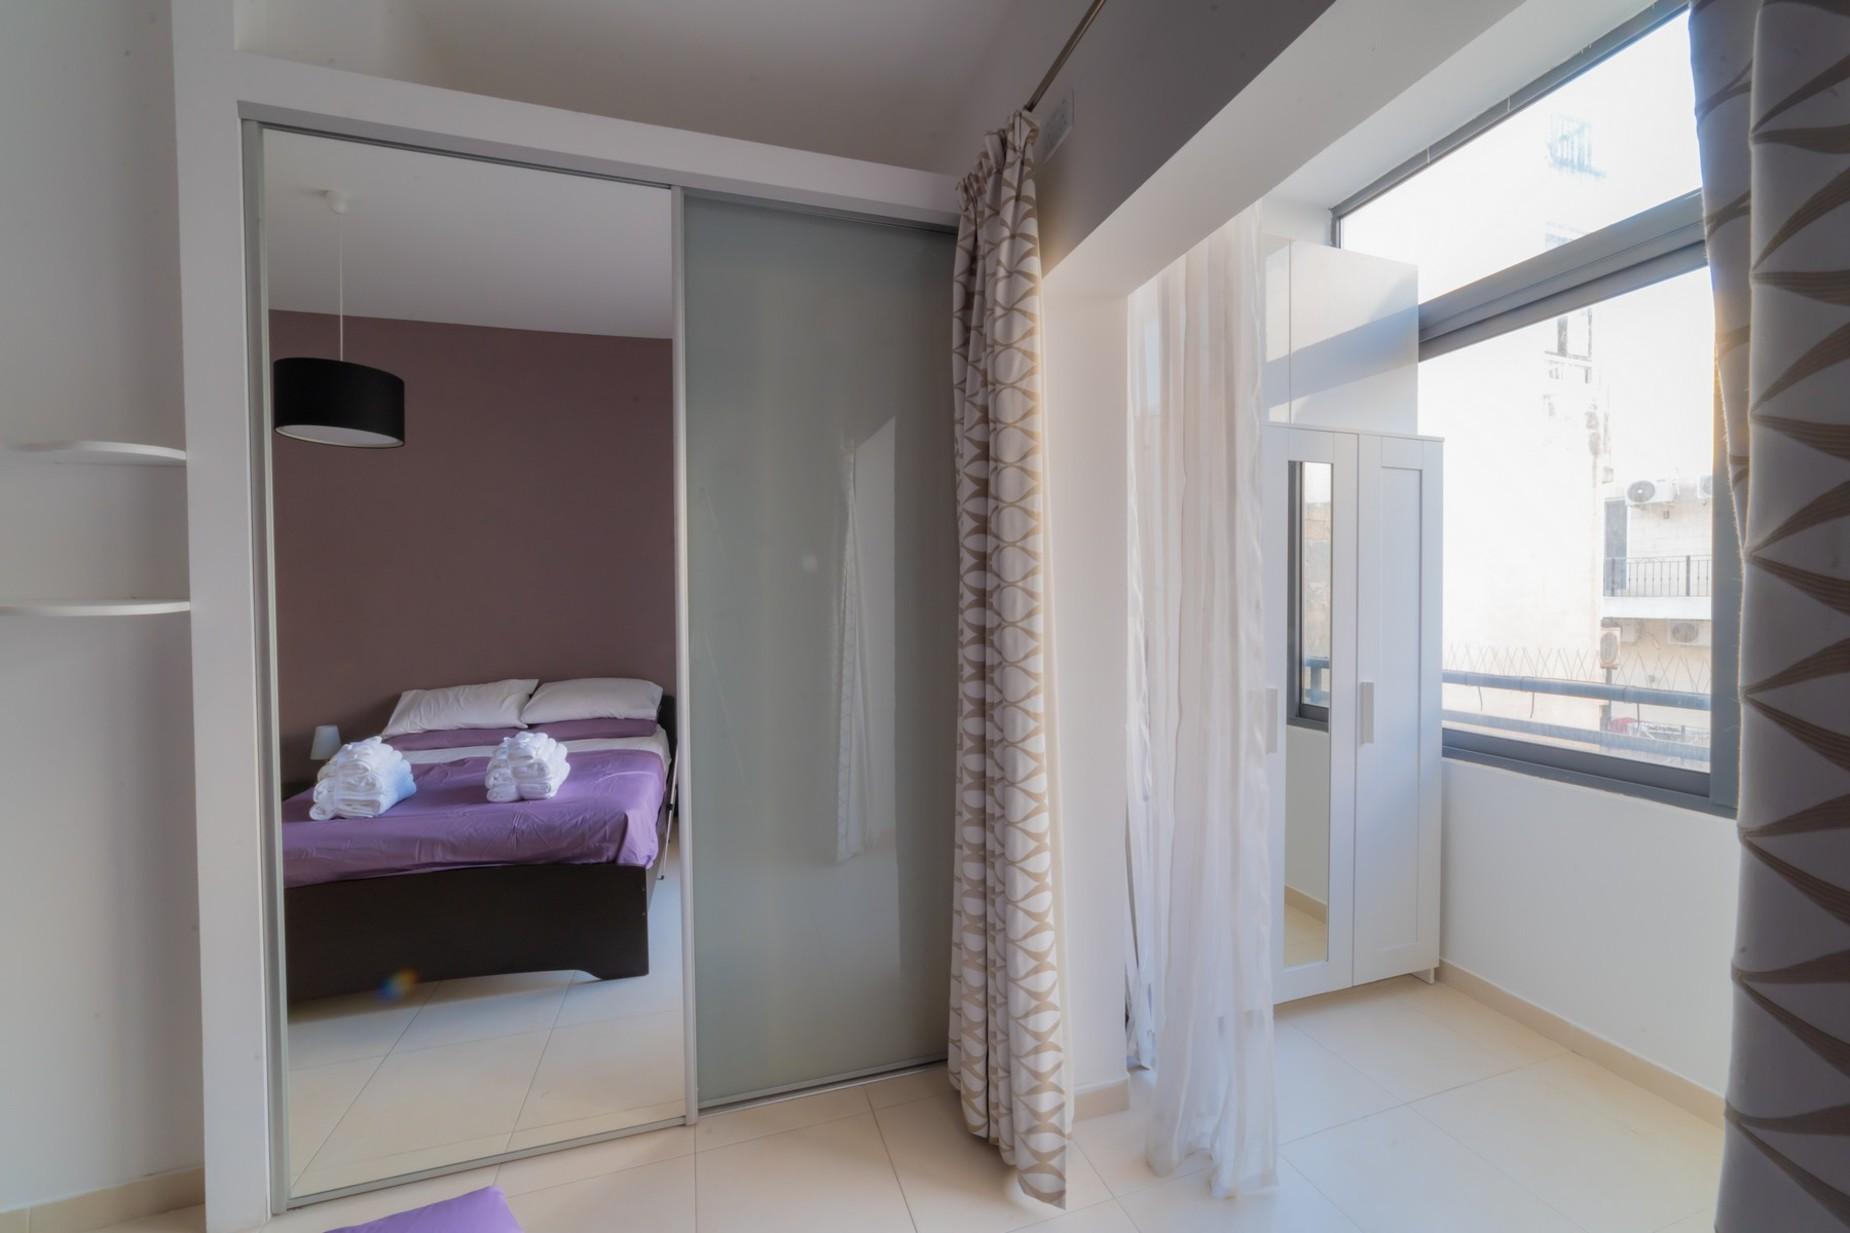 3 bed Apartment For Rent in Sliema, Sliema - thumb 7